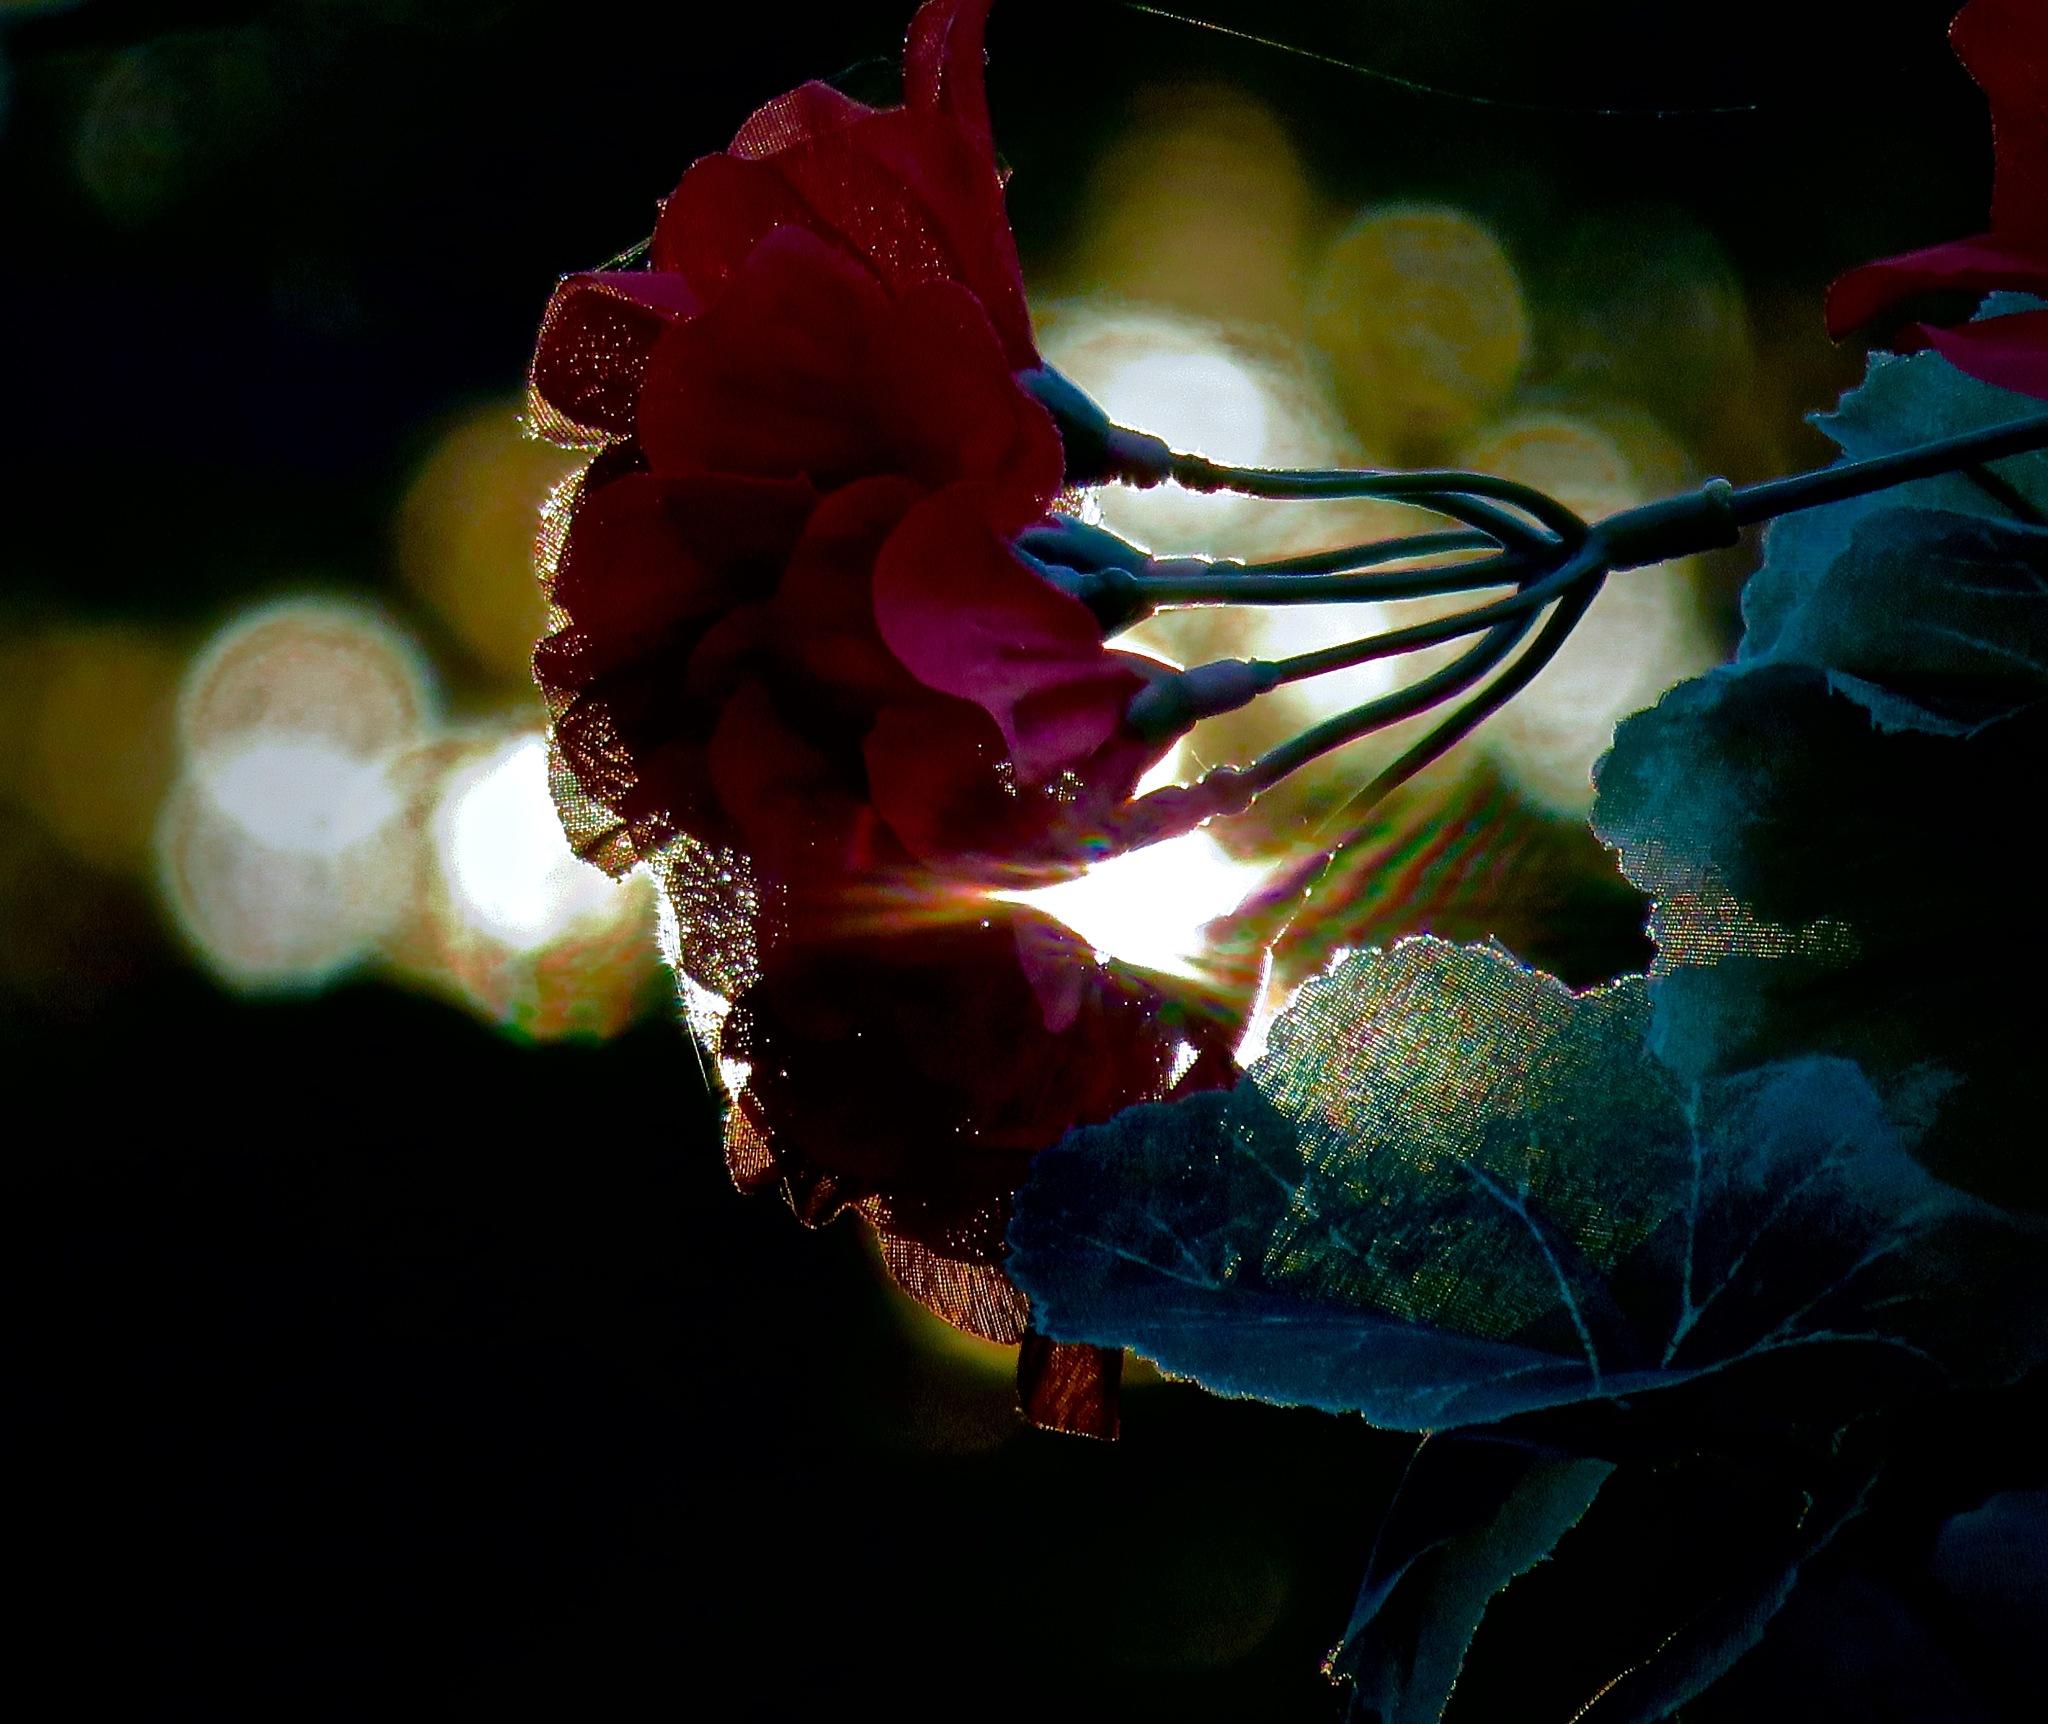 do funny flowers feel it when in the breeze ?? by David Devion